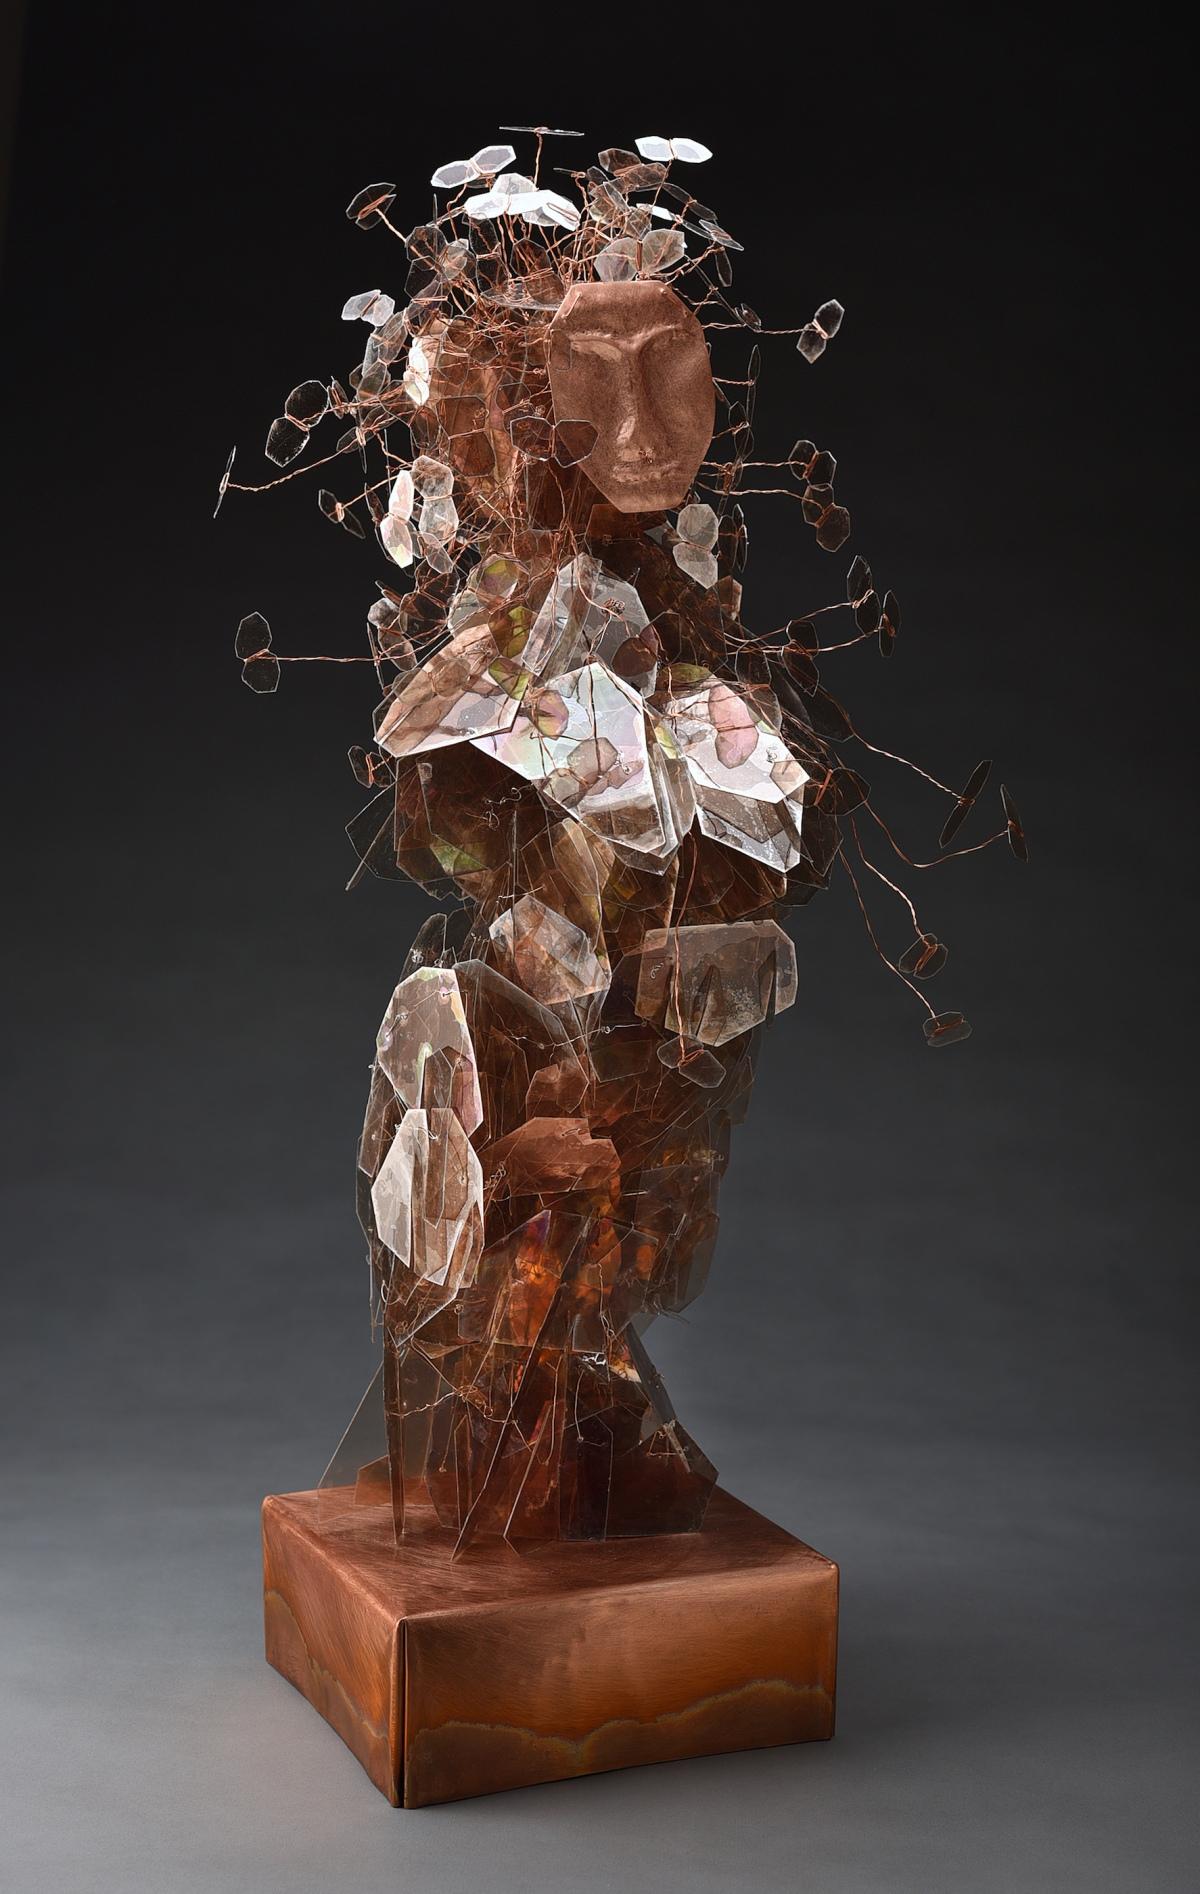 "Eve_s Daughters front view CEnzHack mica, wire, copper, Swarovski crystal 31x15x15"" 2018 Josh Farr Sm"